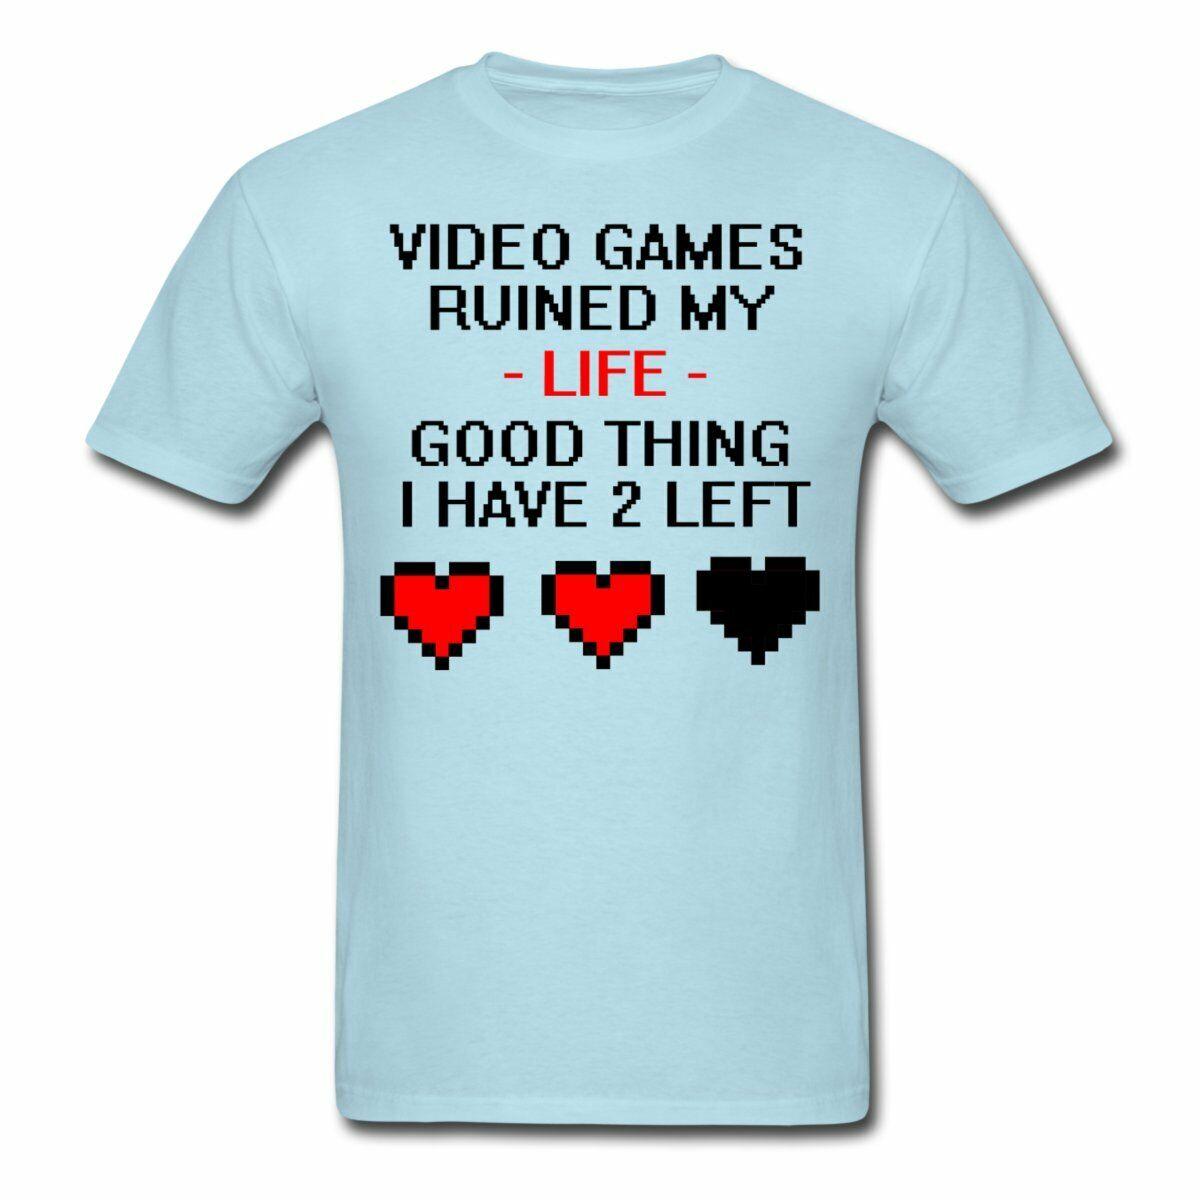 VIDEO GAMES RUINED MY LIFE FUNNY PRINTED MENS TSHIRT GAMER GEEK NERD GIFT PS4 X